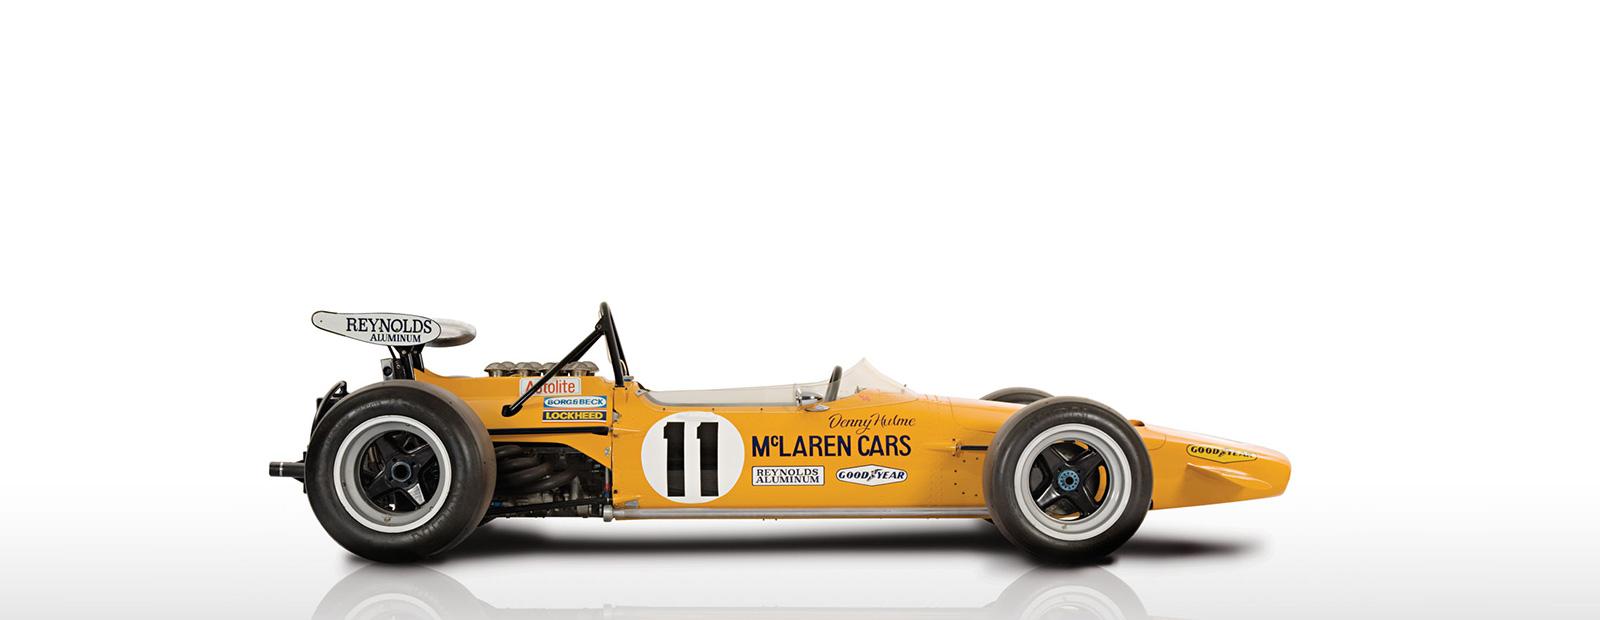 mclaren formula 1 - heritage - cars